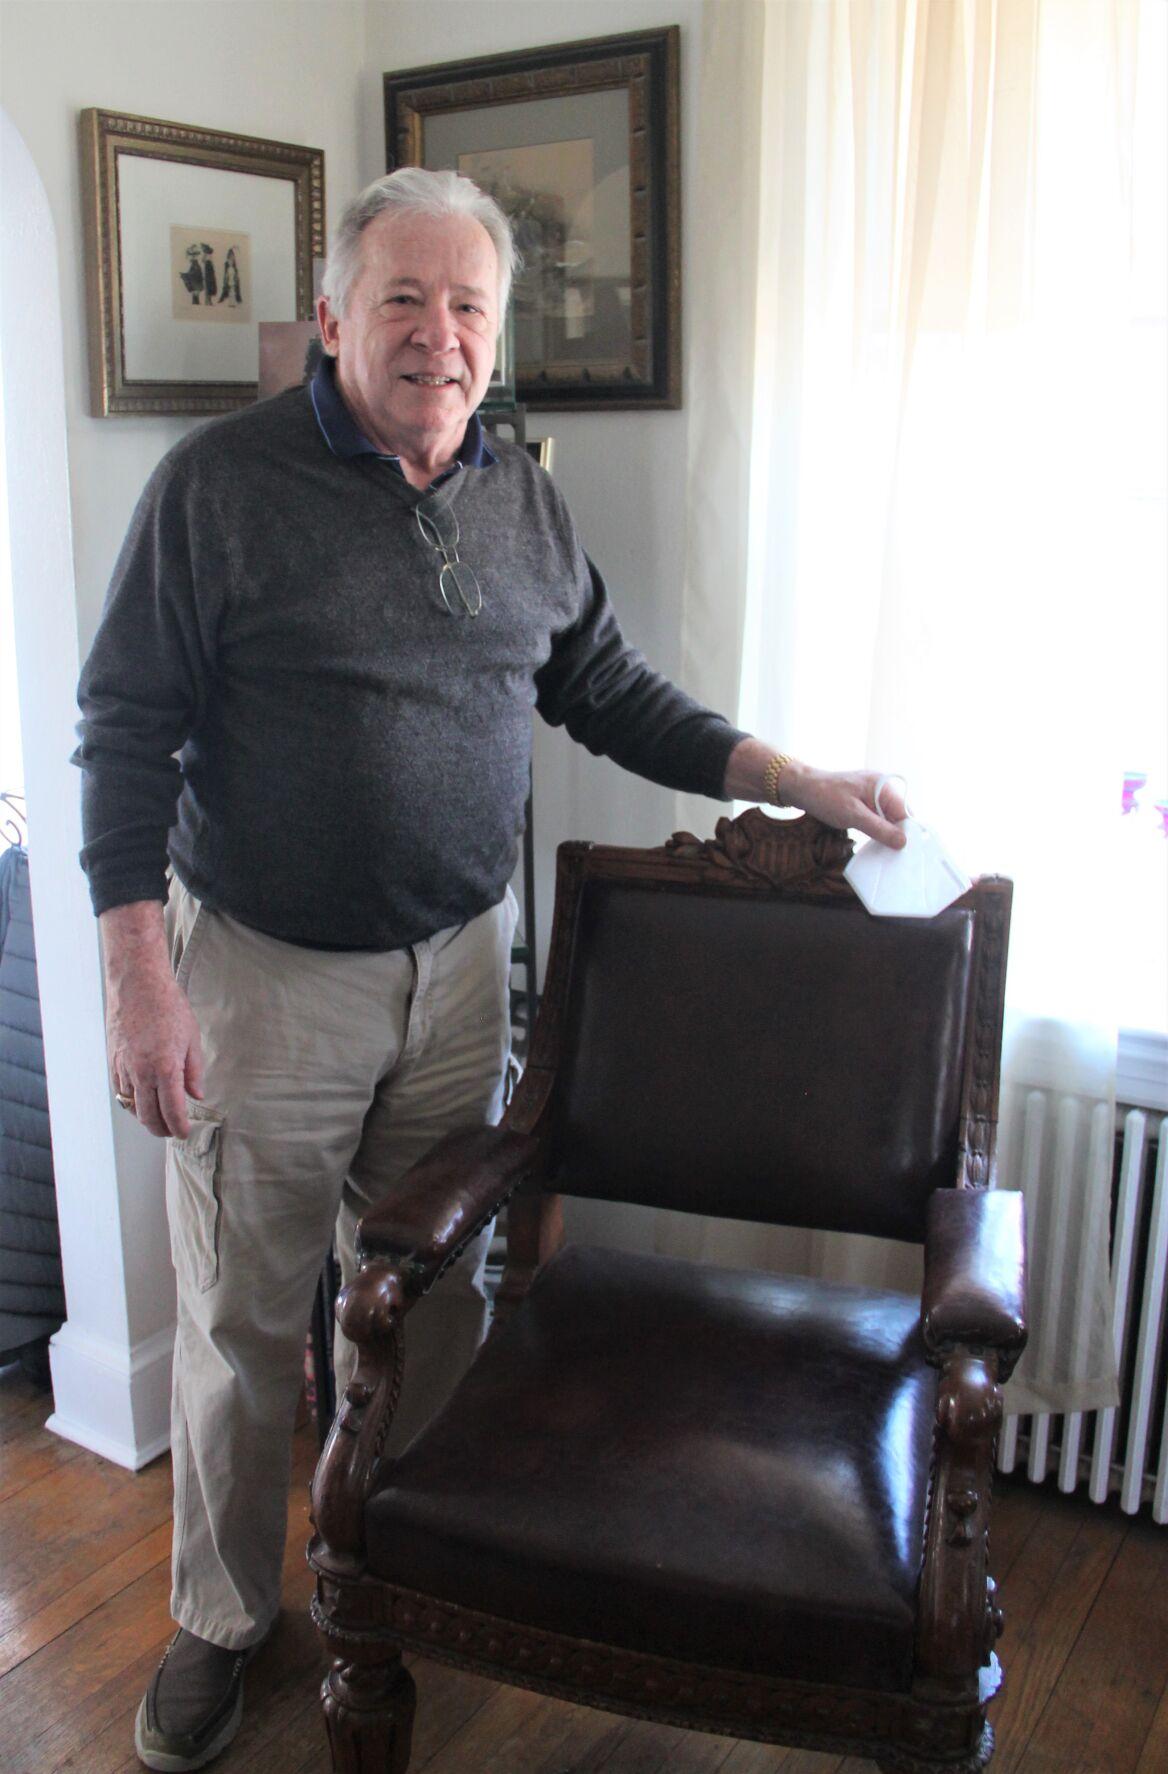 Meet a Loudouner: Harold Brown, owner of Bachrach Photography